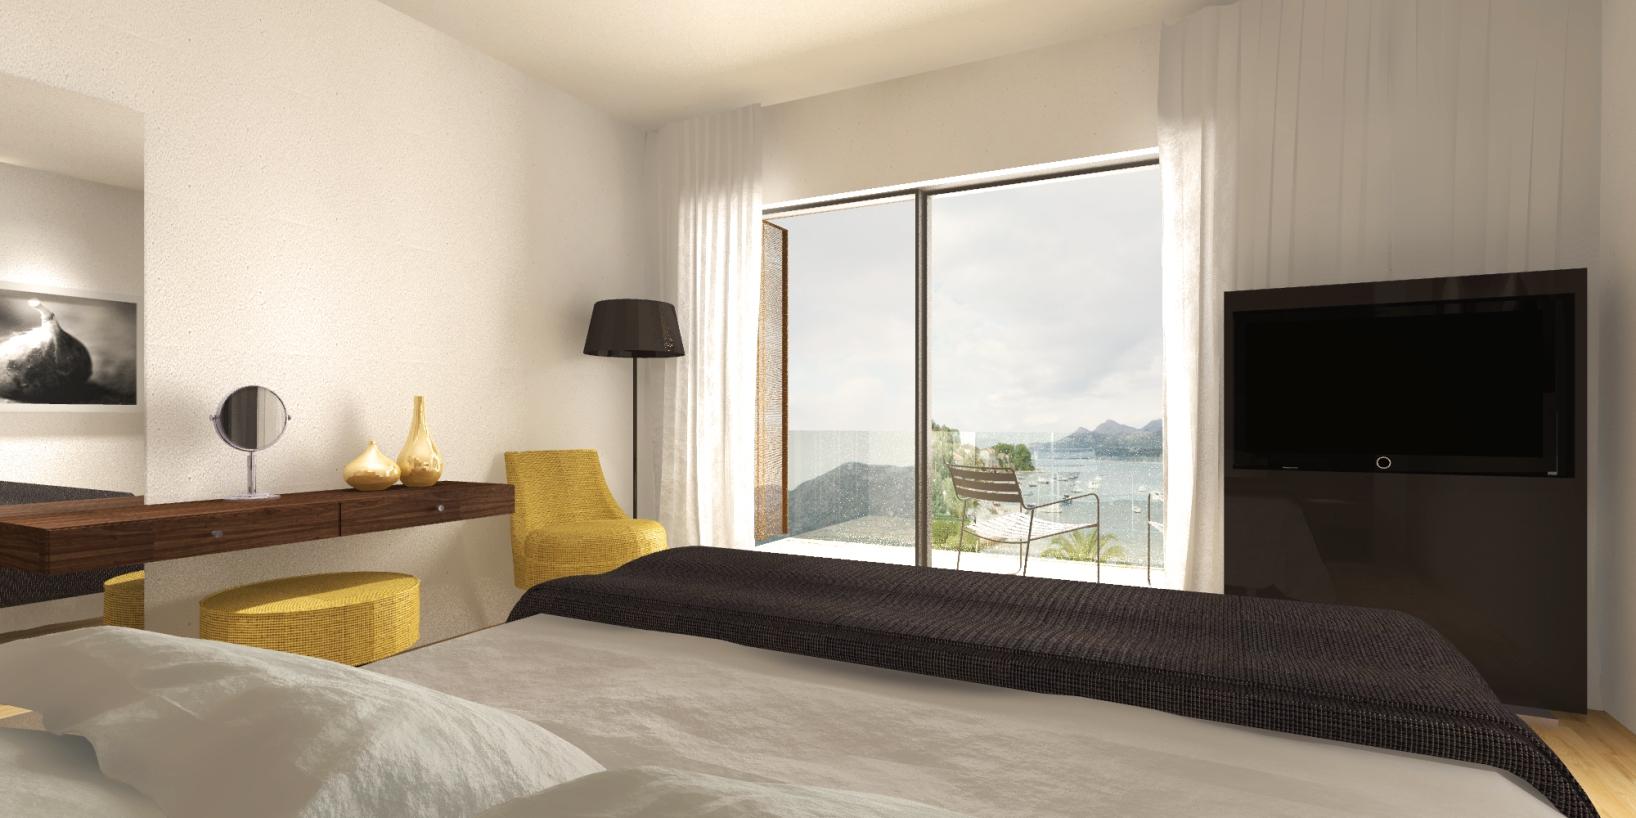 An Island Hotel Room Interior